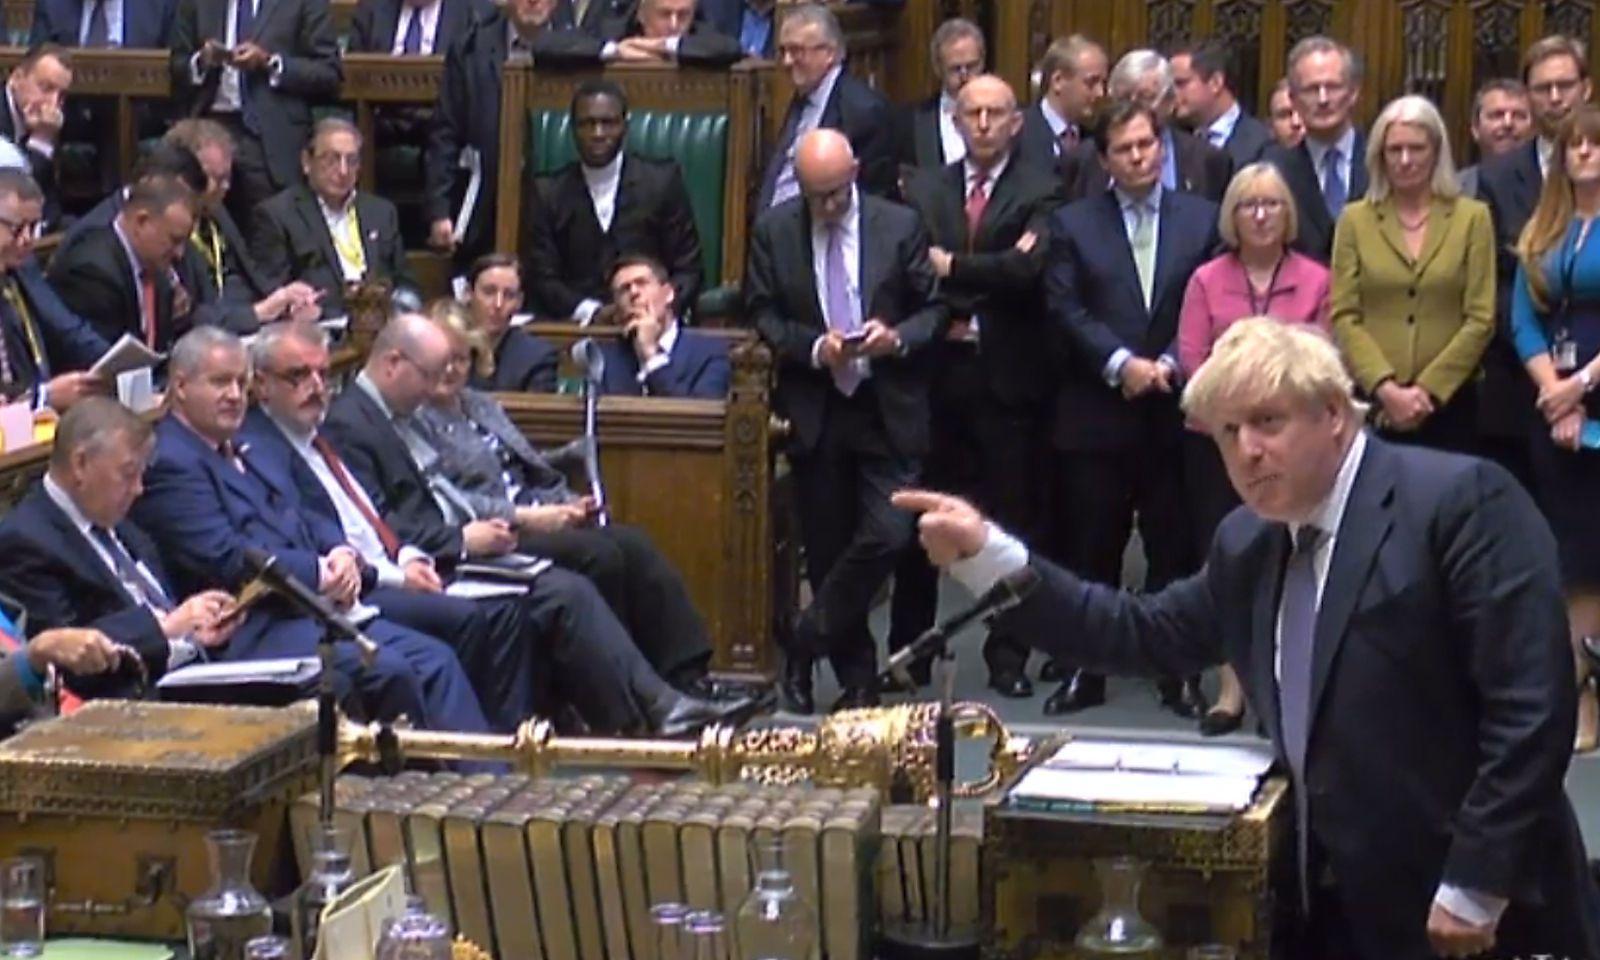 Premier Boris Johnson will Neuwahl am 12. Dezember - Politik